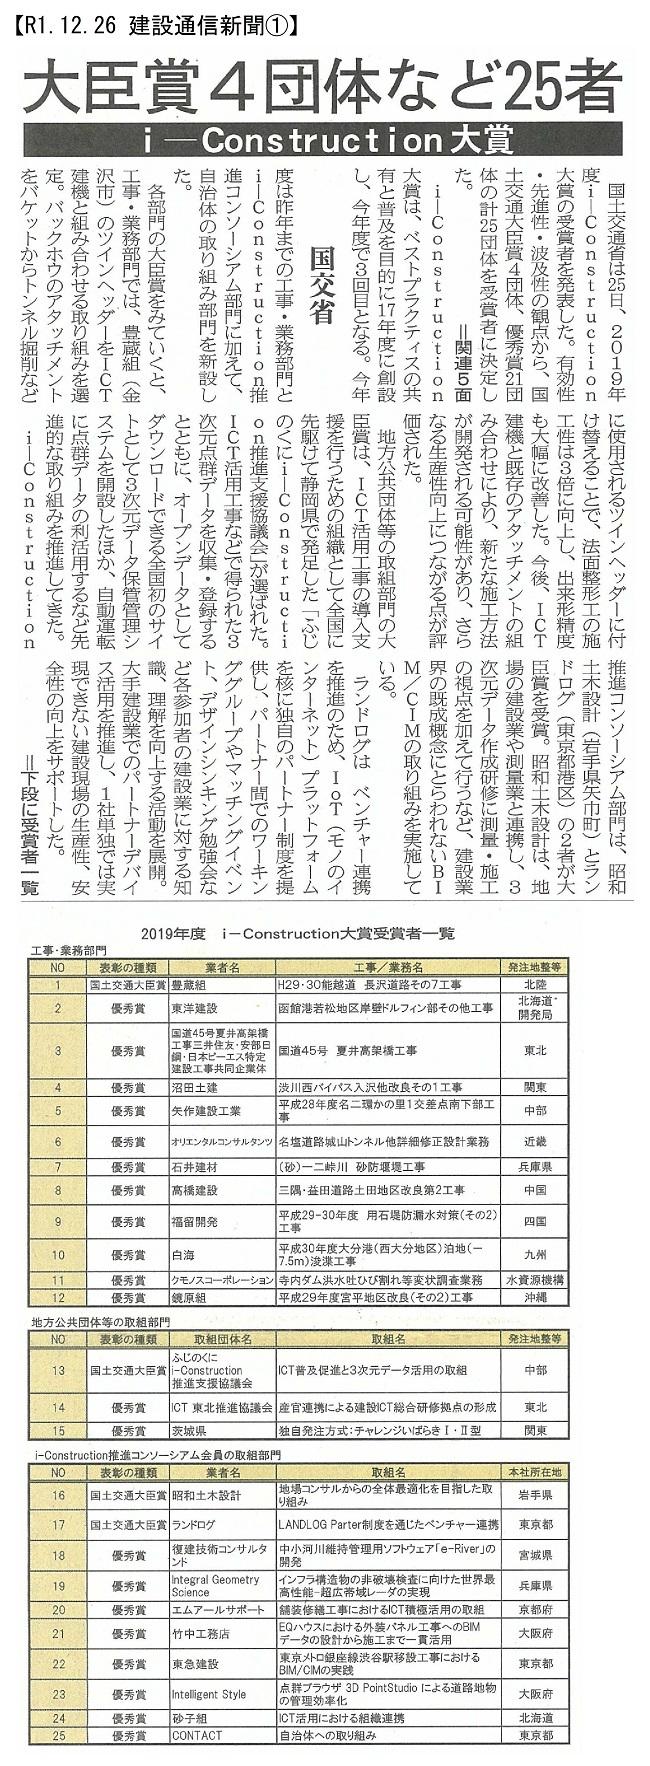 20191226 i-Construction大賞・国交省:建設通信新聞①(A3)